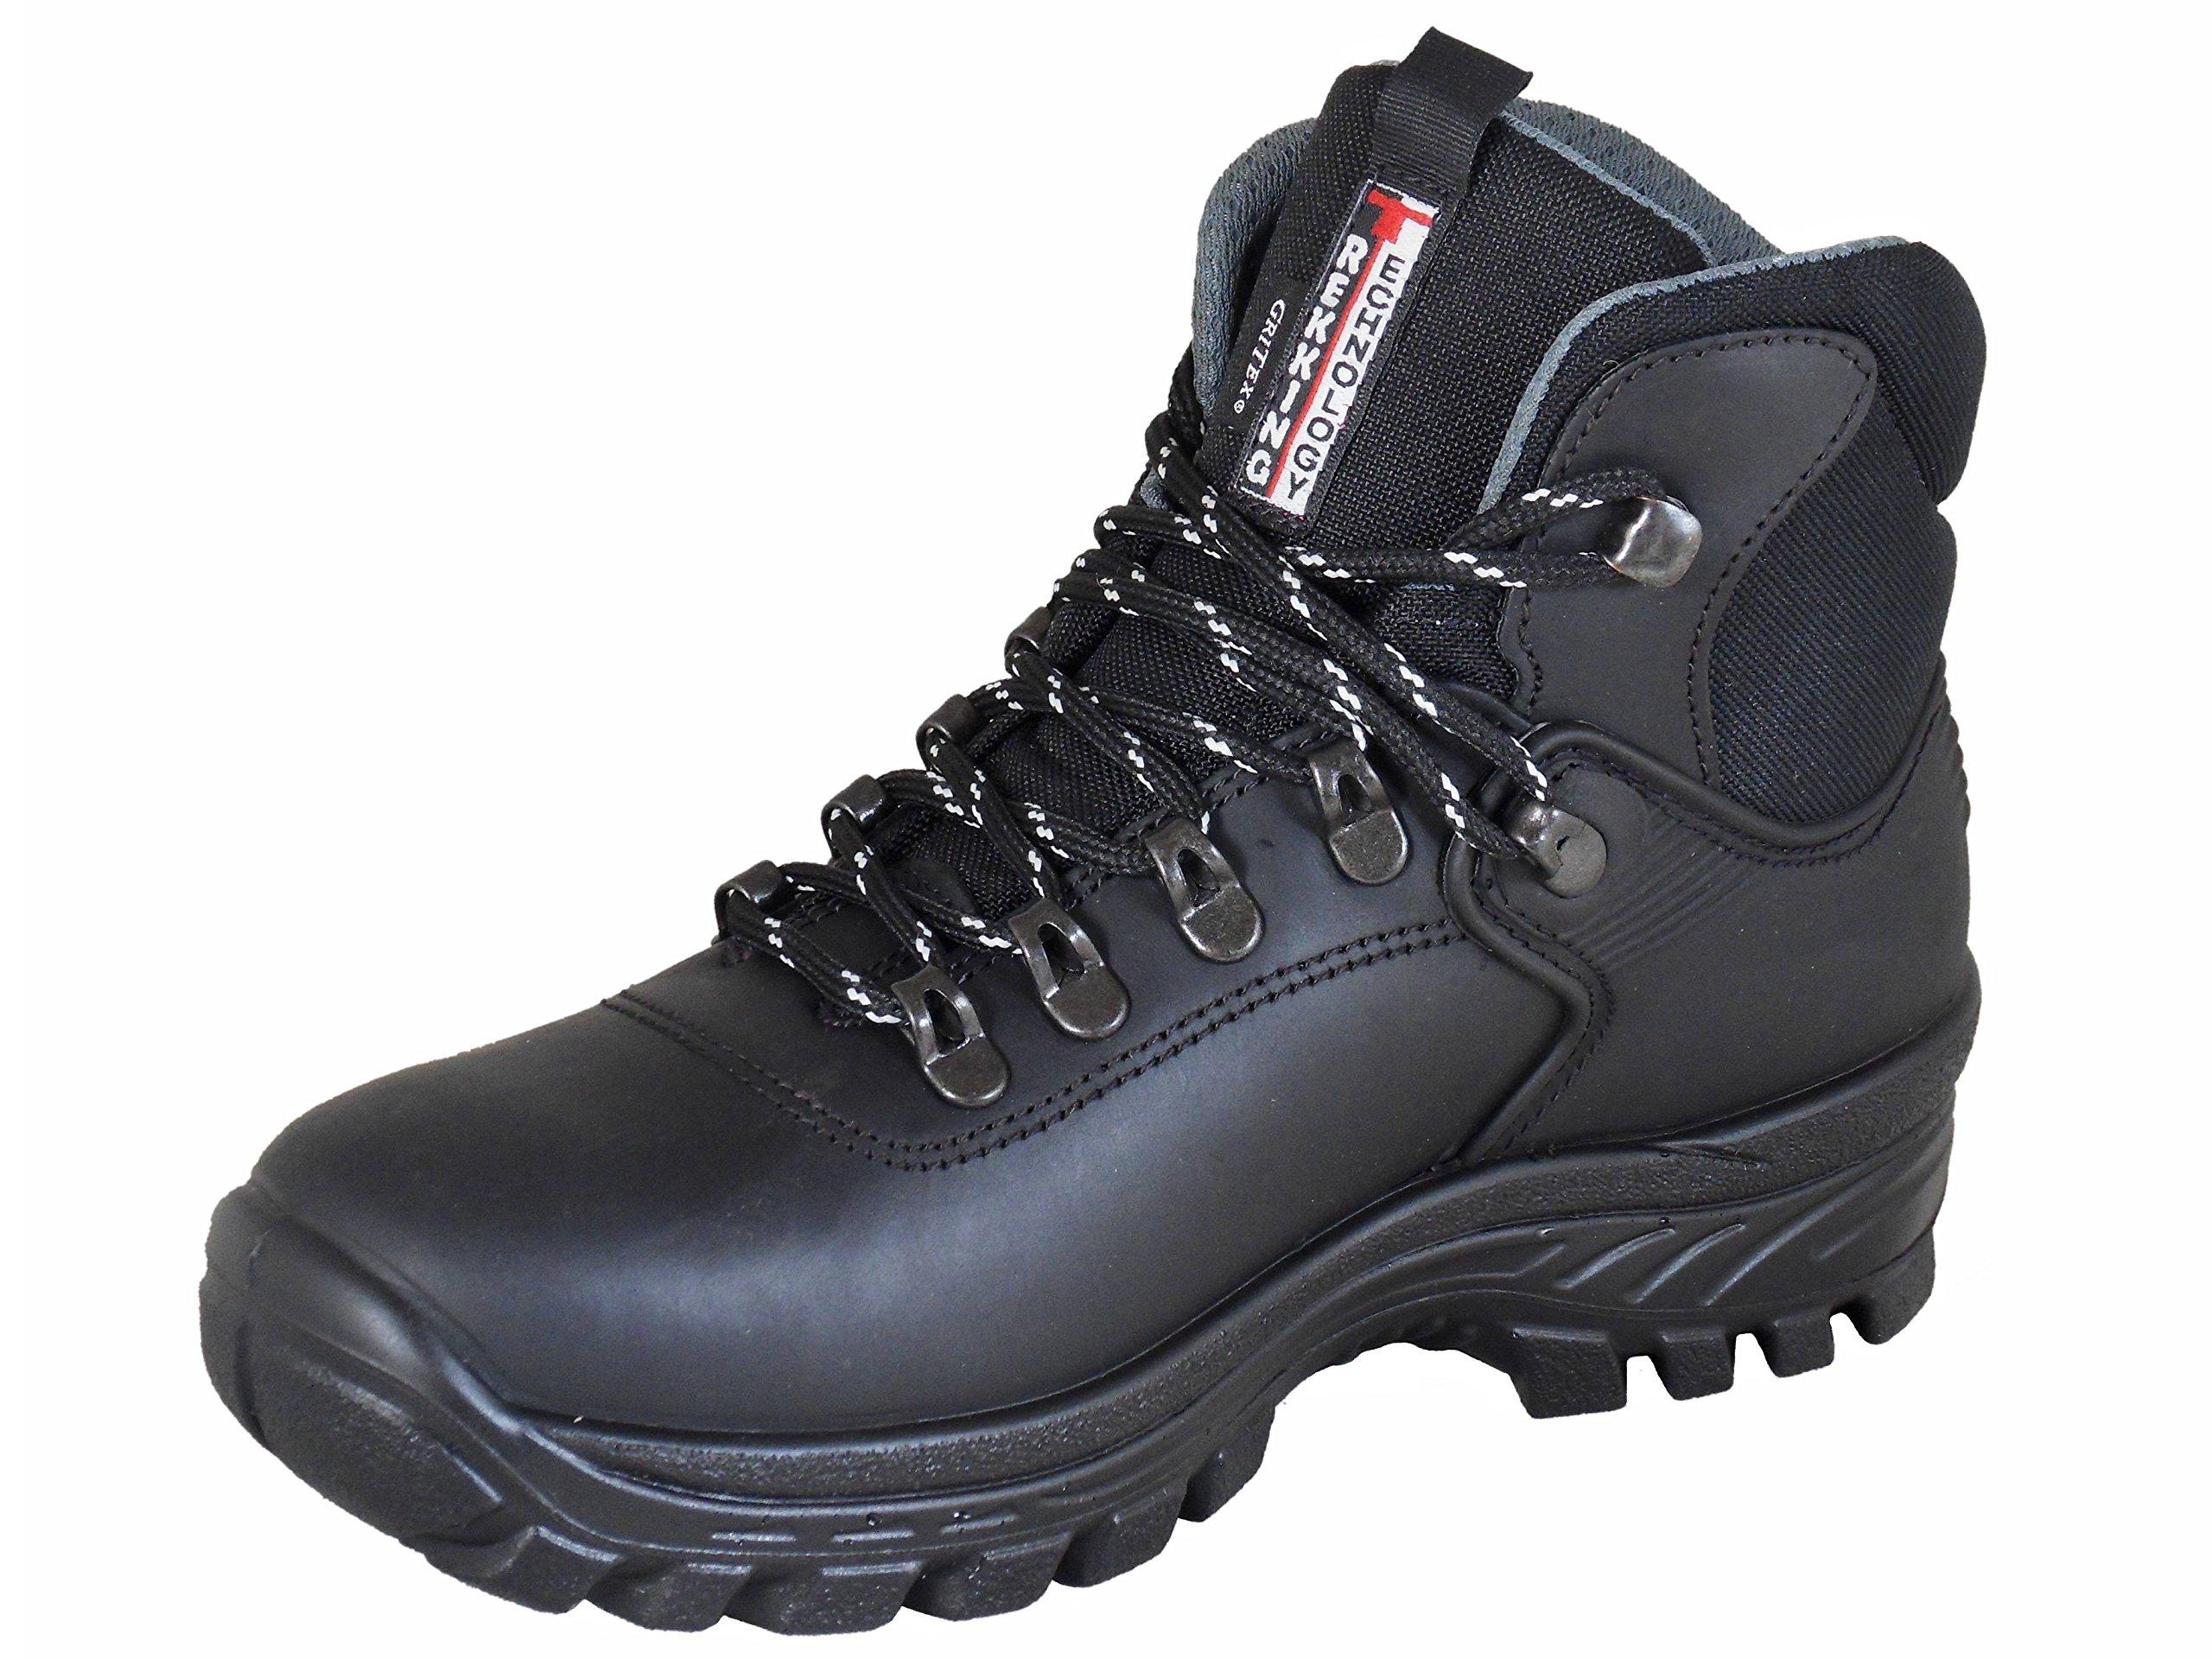 91kojbwCKuL - Grisport Explorer Ladies Lightweight Waterproof Walking Boots Black